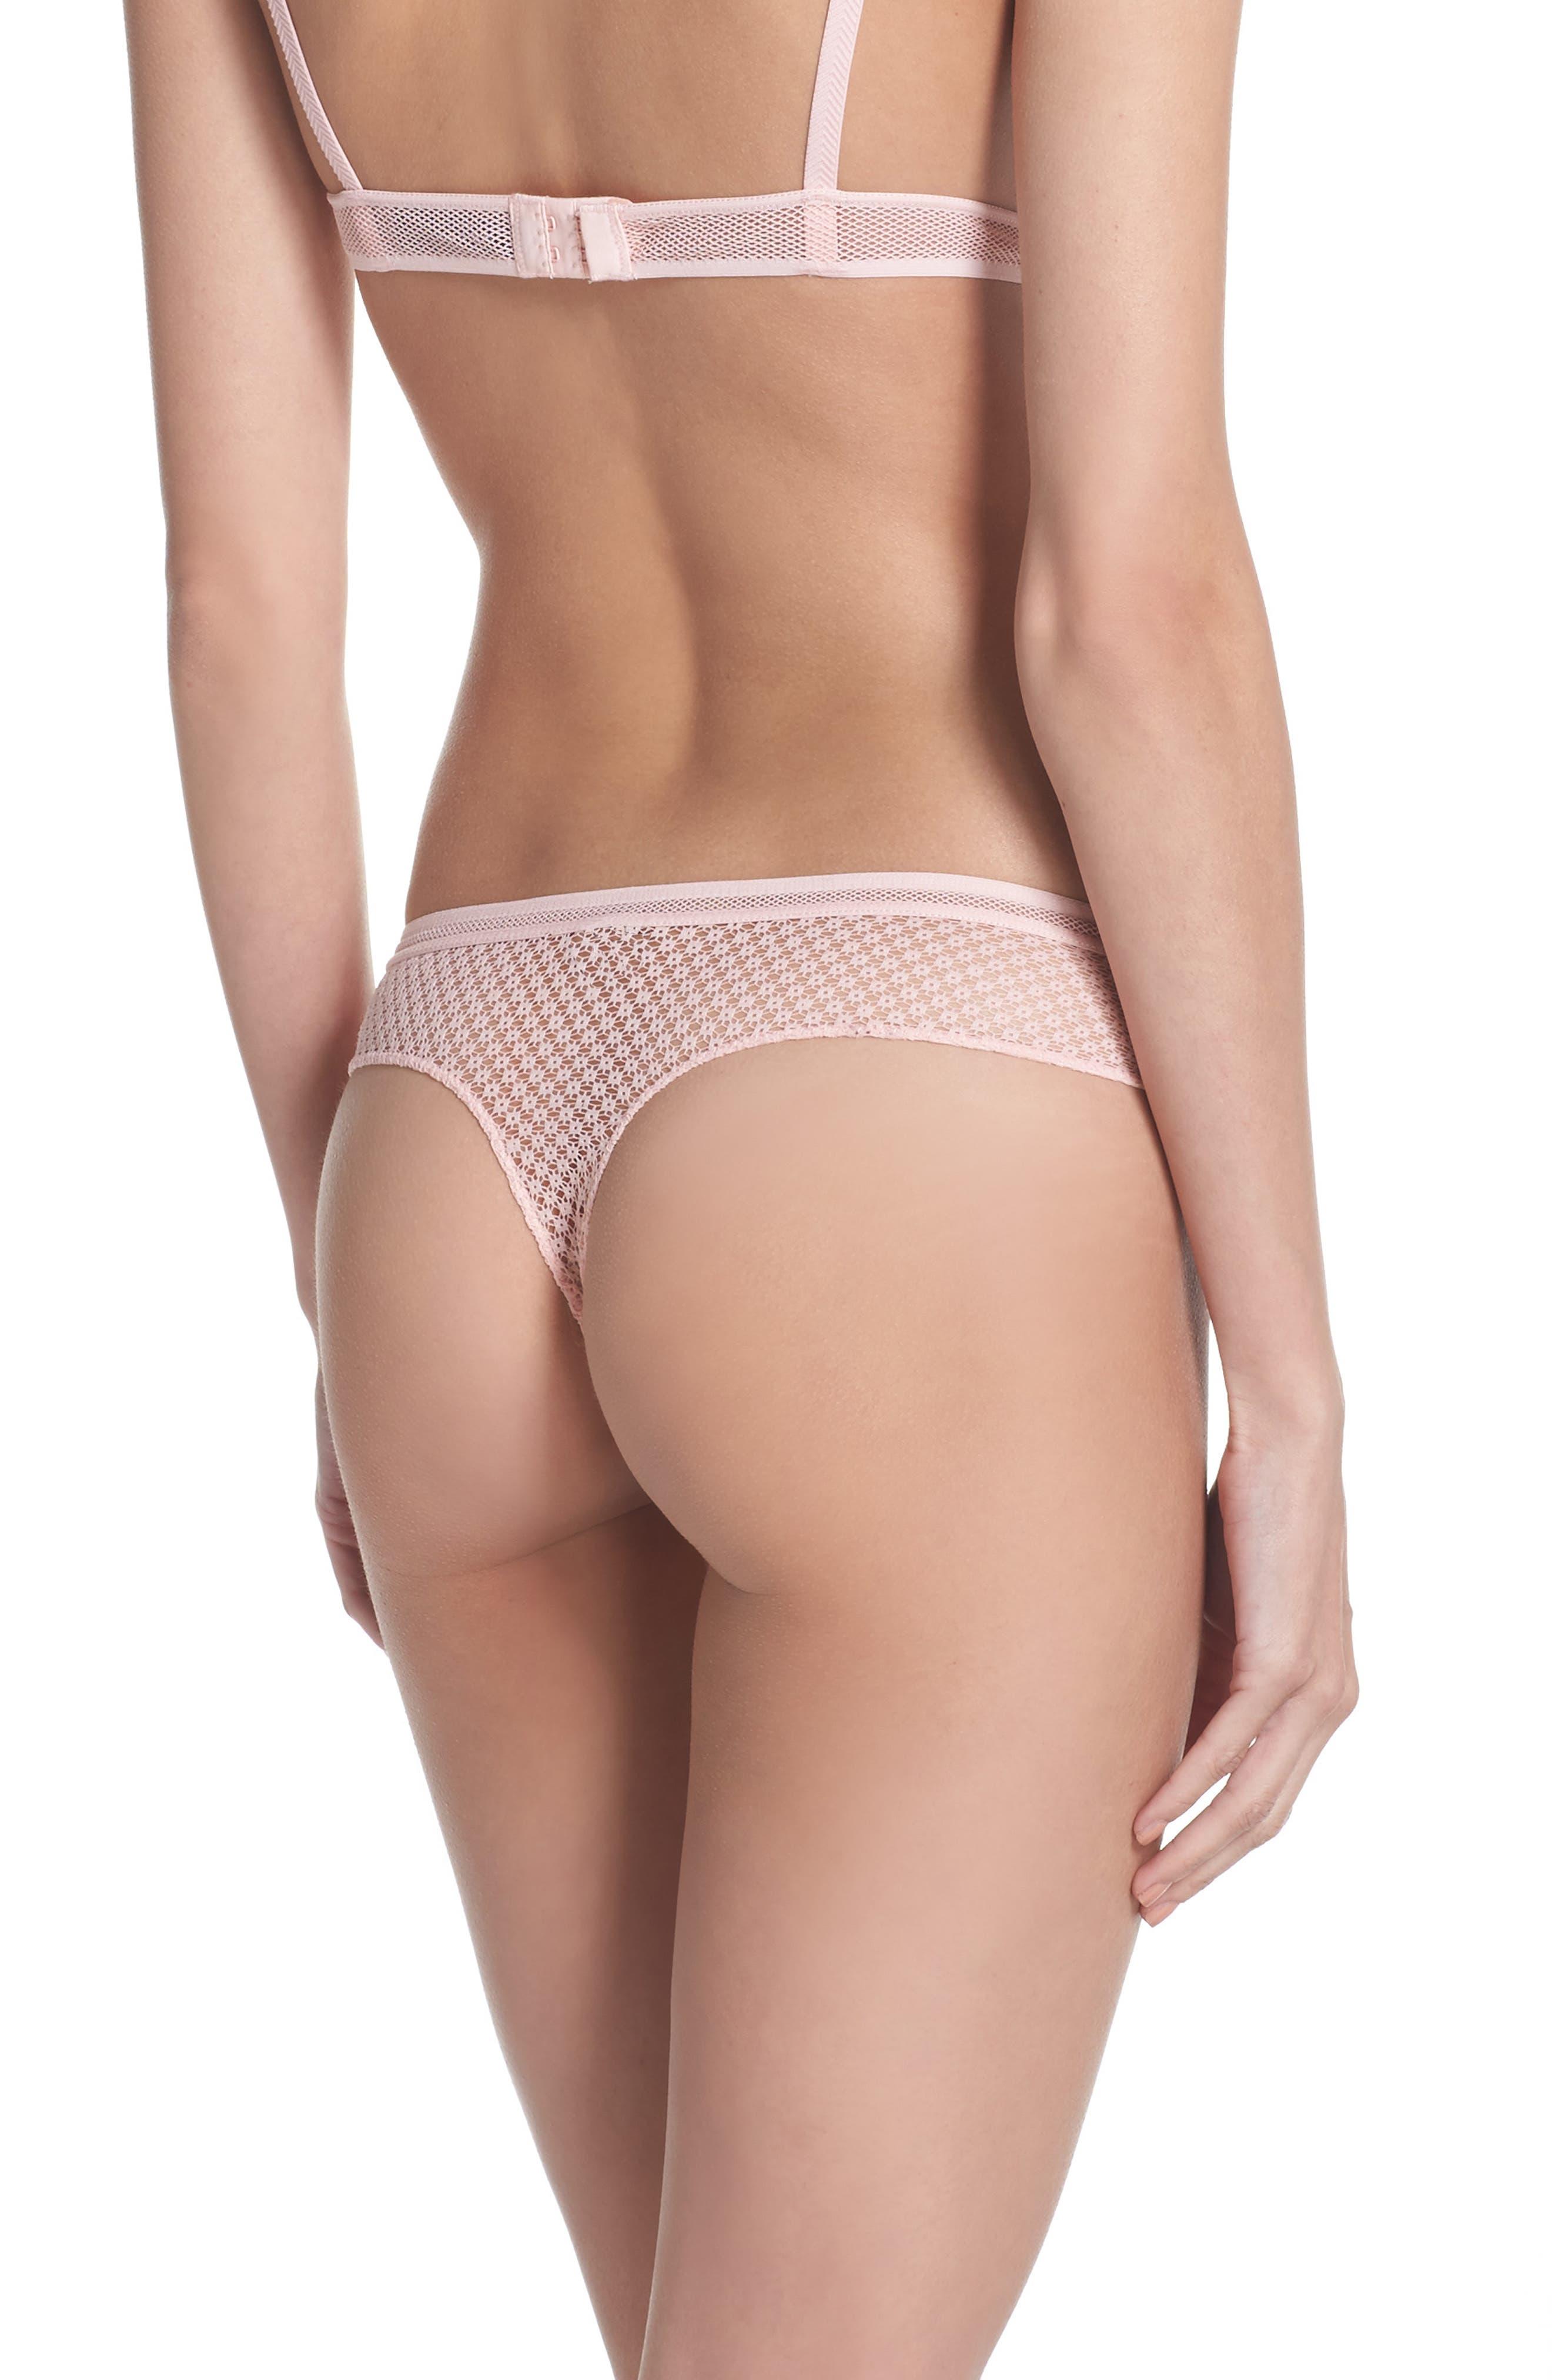 Alternate Image 2  - Sam Edelman Lace Thong (3 for $33)